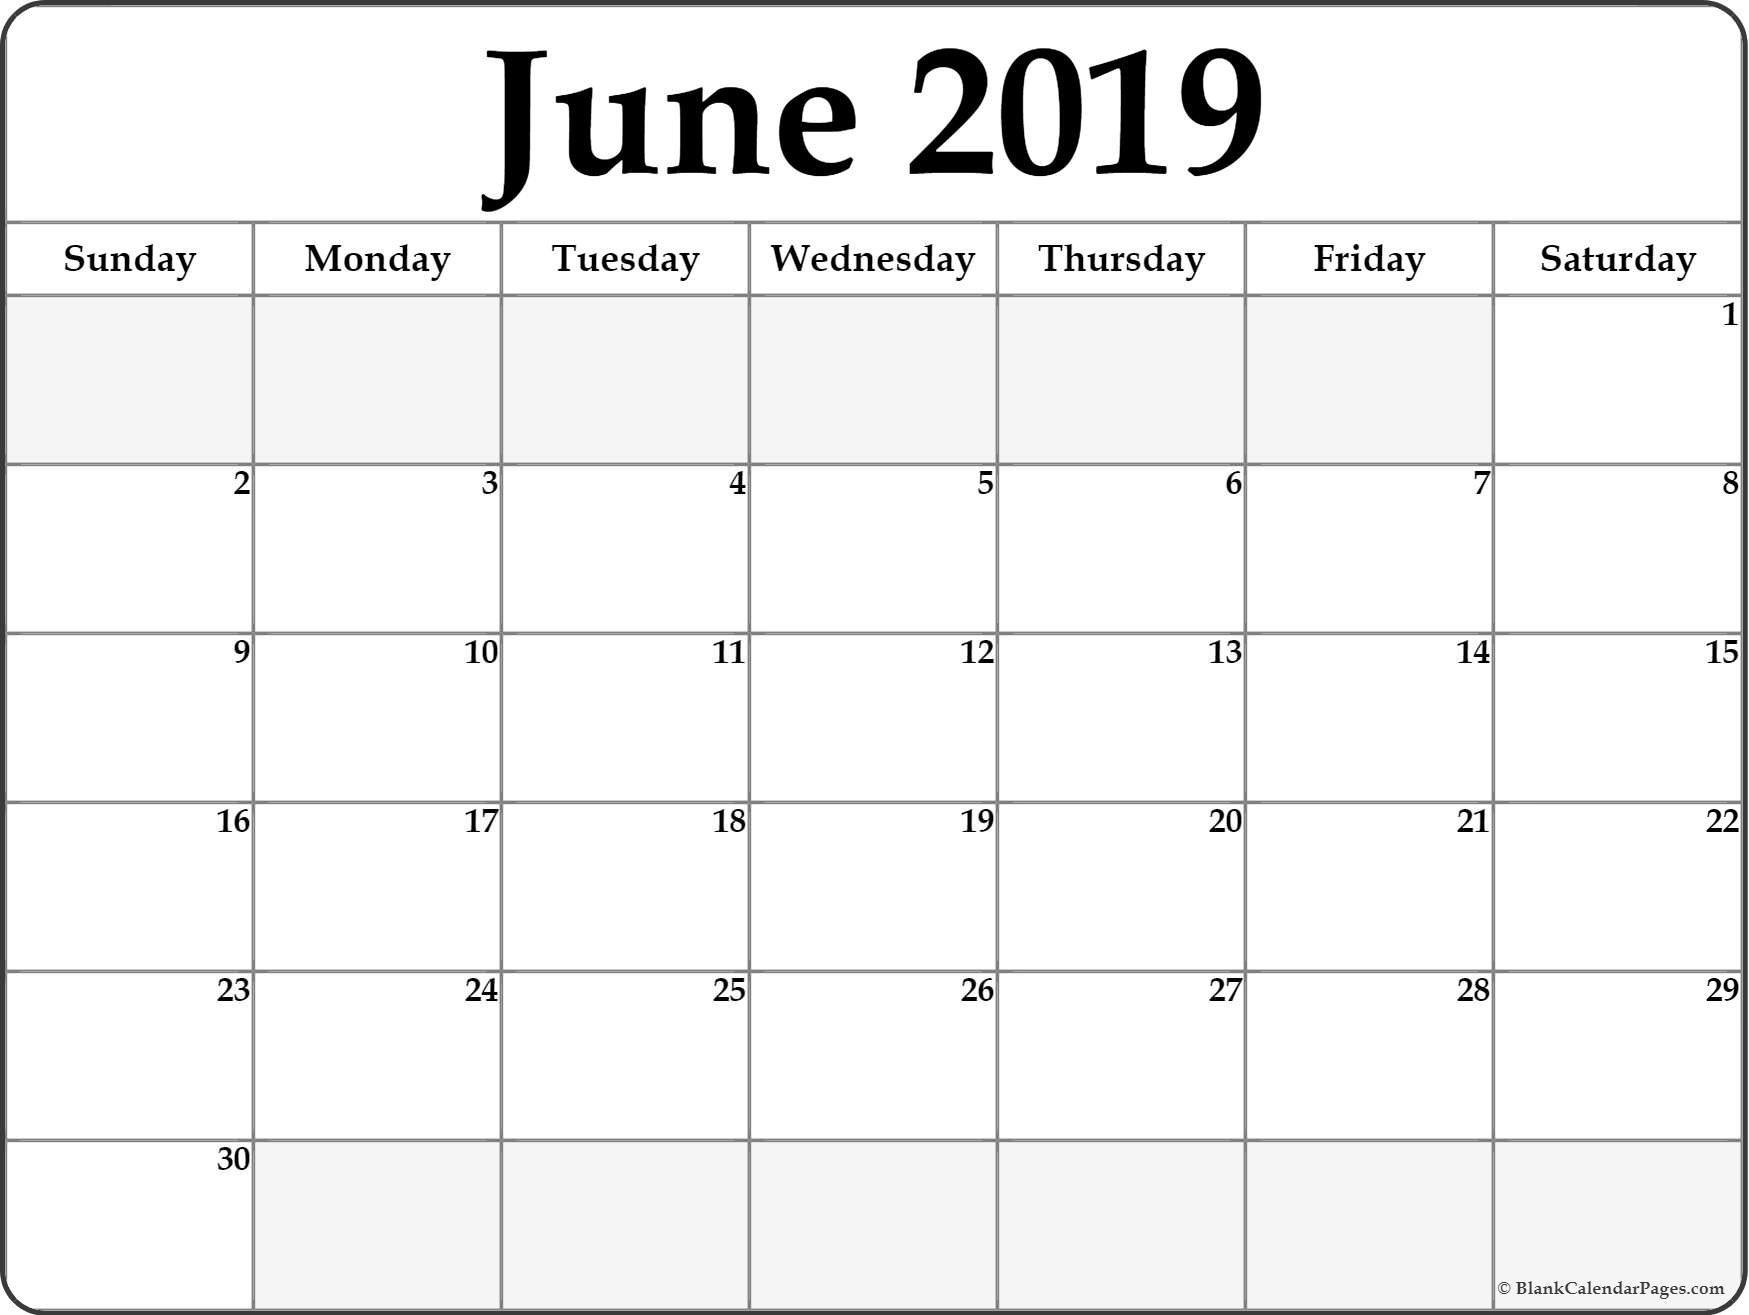 June 2019 Calendar   Free Printable Monthly Calendars June 2 2019 Calendar